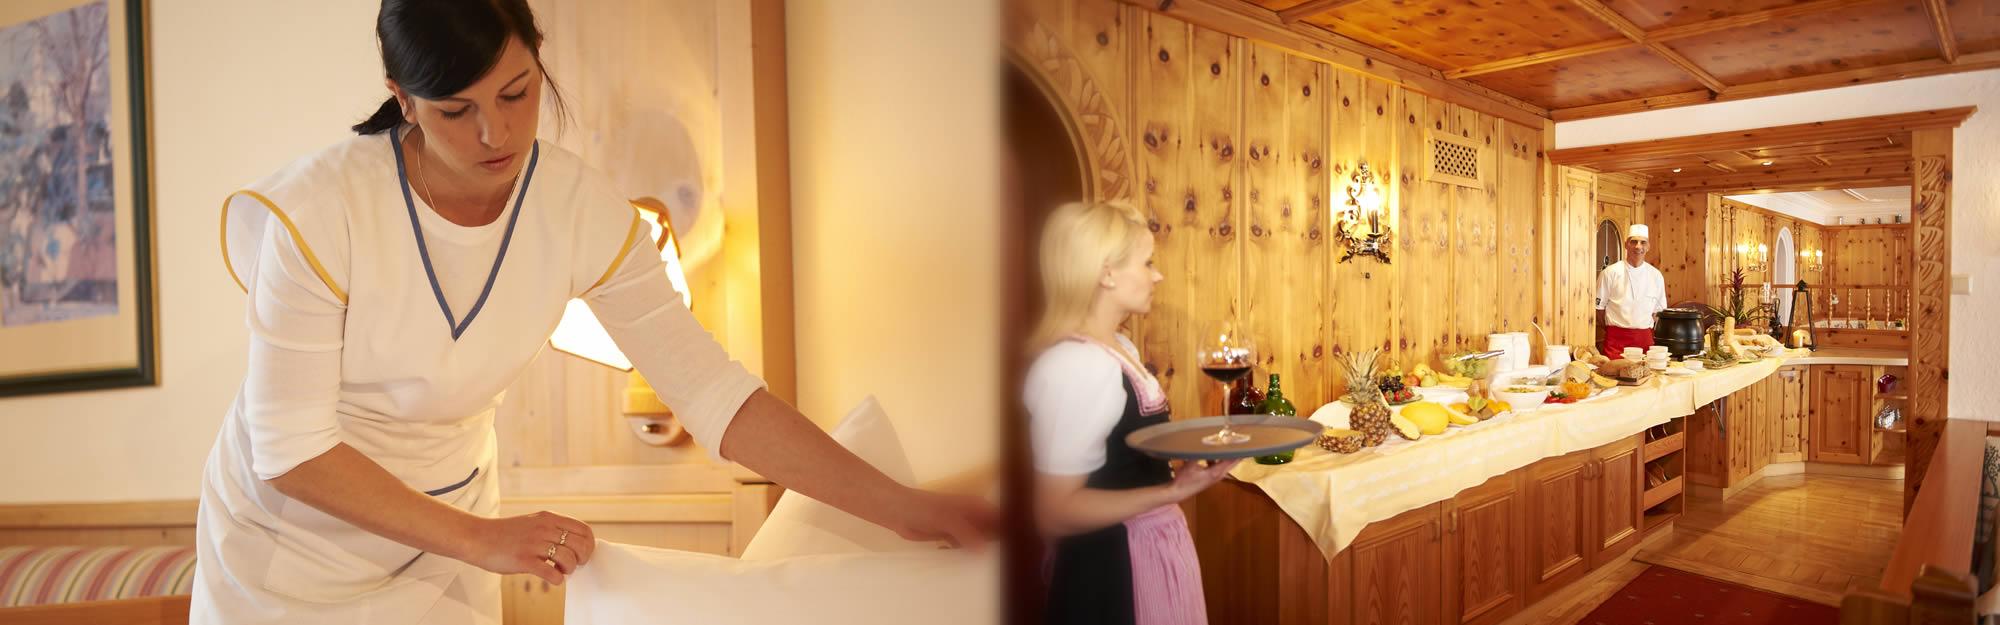 Stellenangebote hotel koch obertauern for Stellenangebote koch